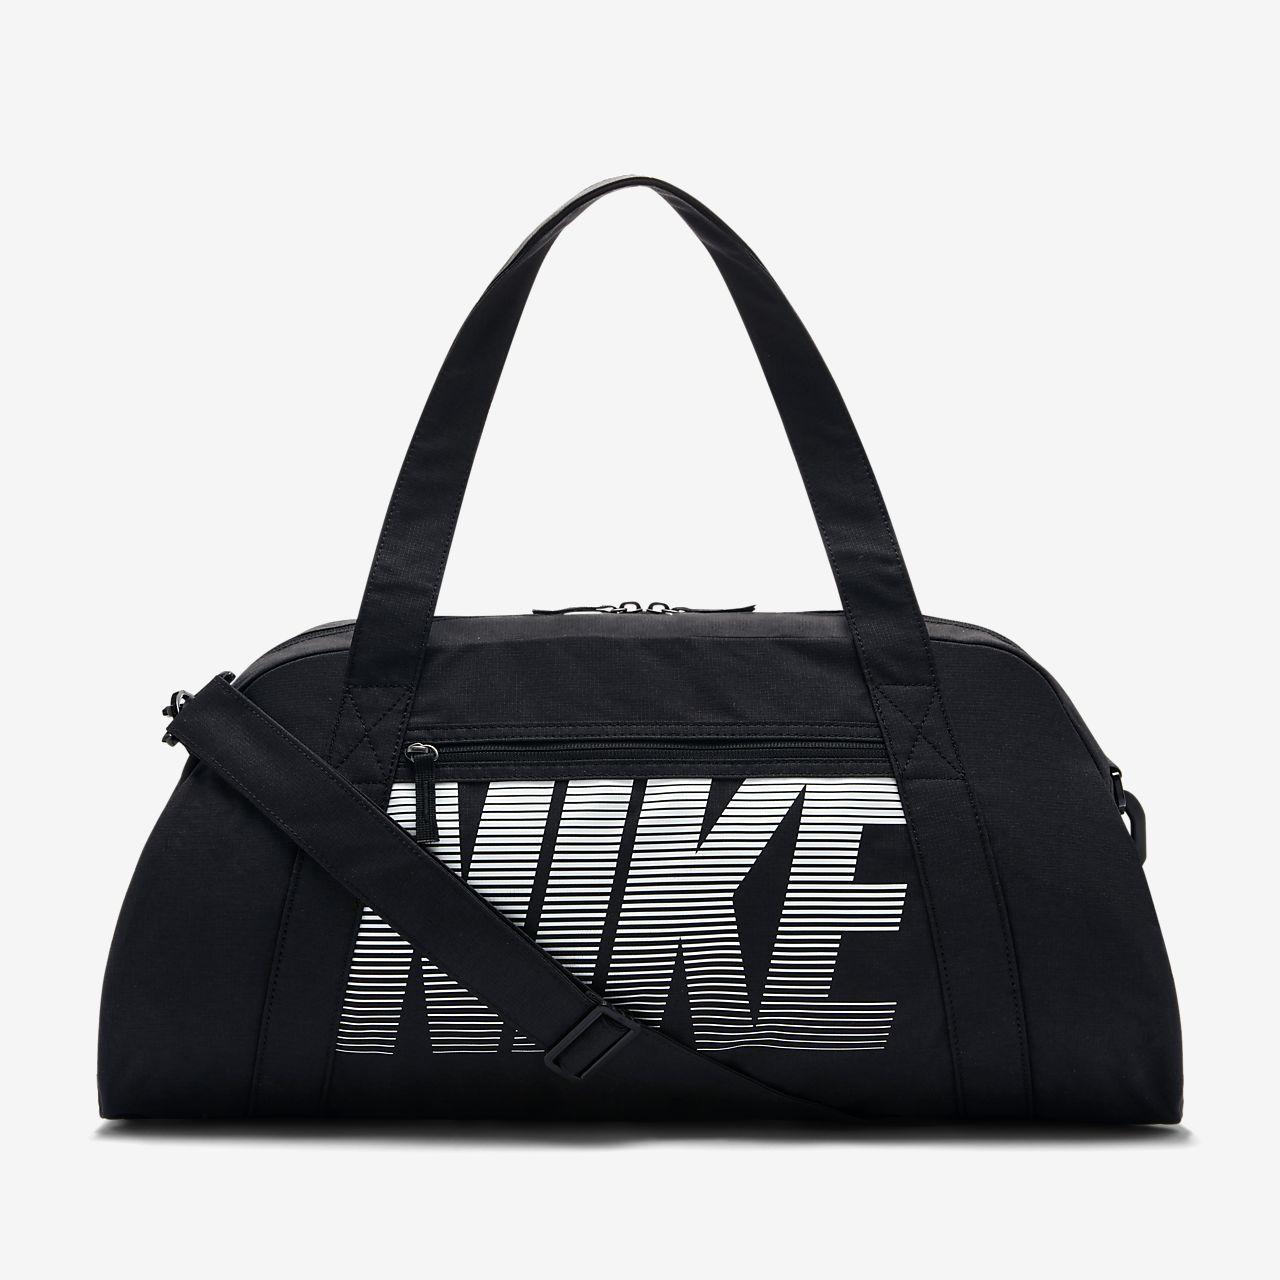 b4a950fd5fa3 Buy cheap black nike bag  Up to OFF59% DiscountDiscounts